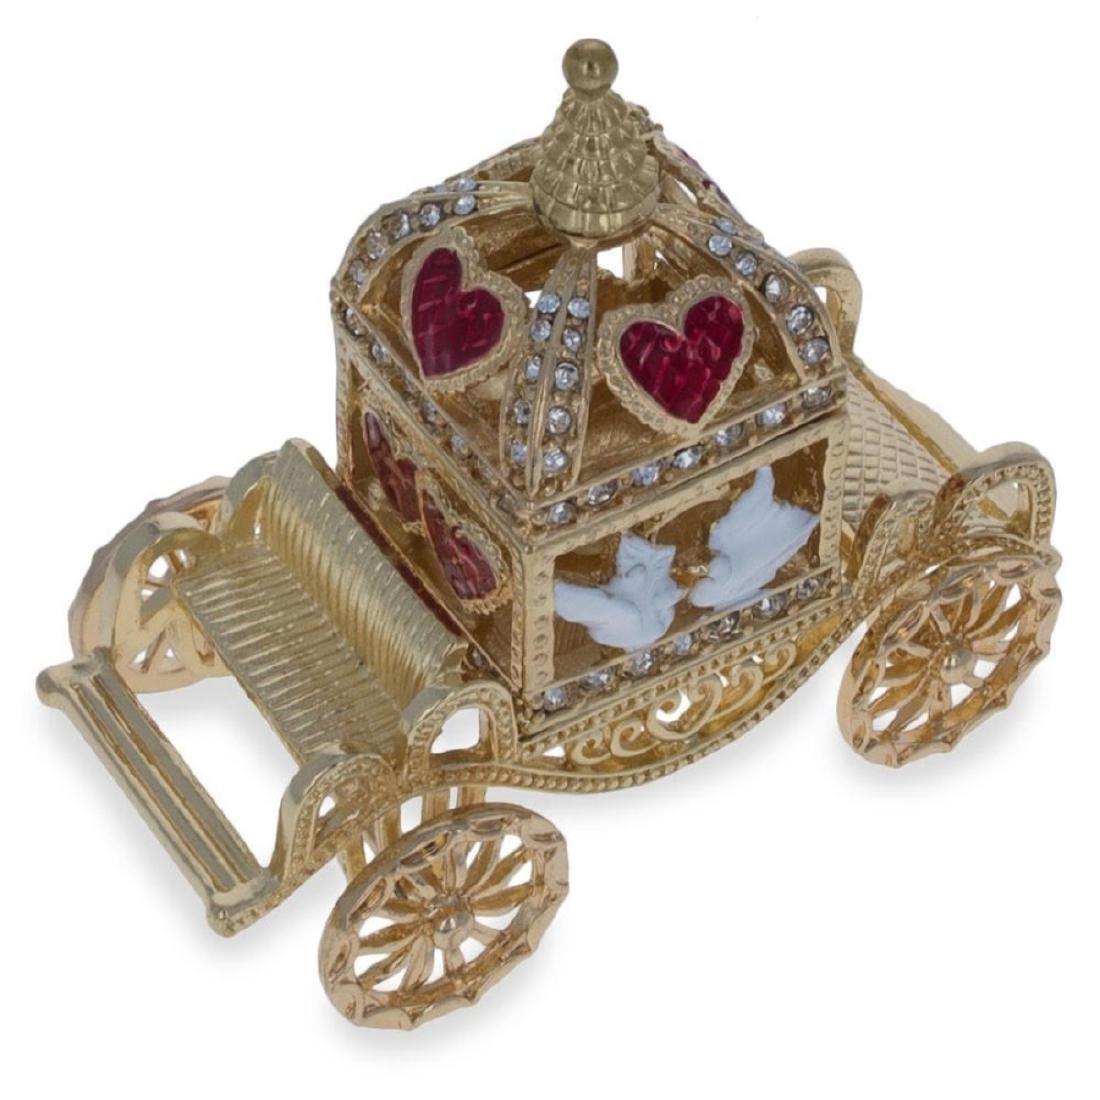 Royal Coronation Coach with Doves Trinket Box Figurine - 5